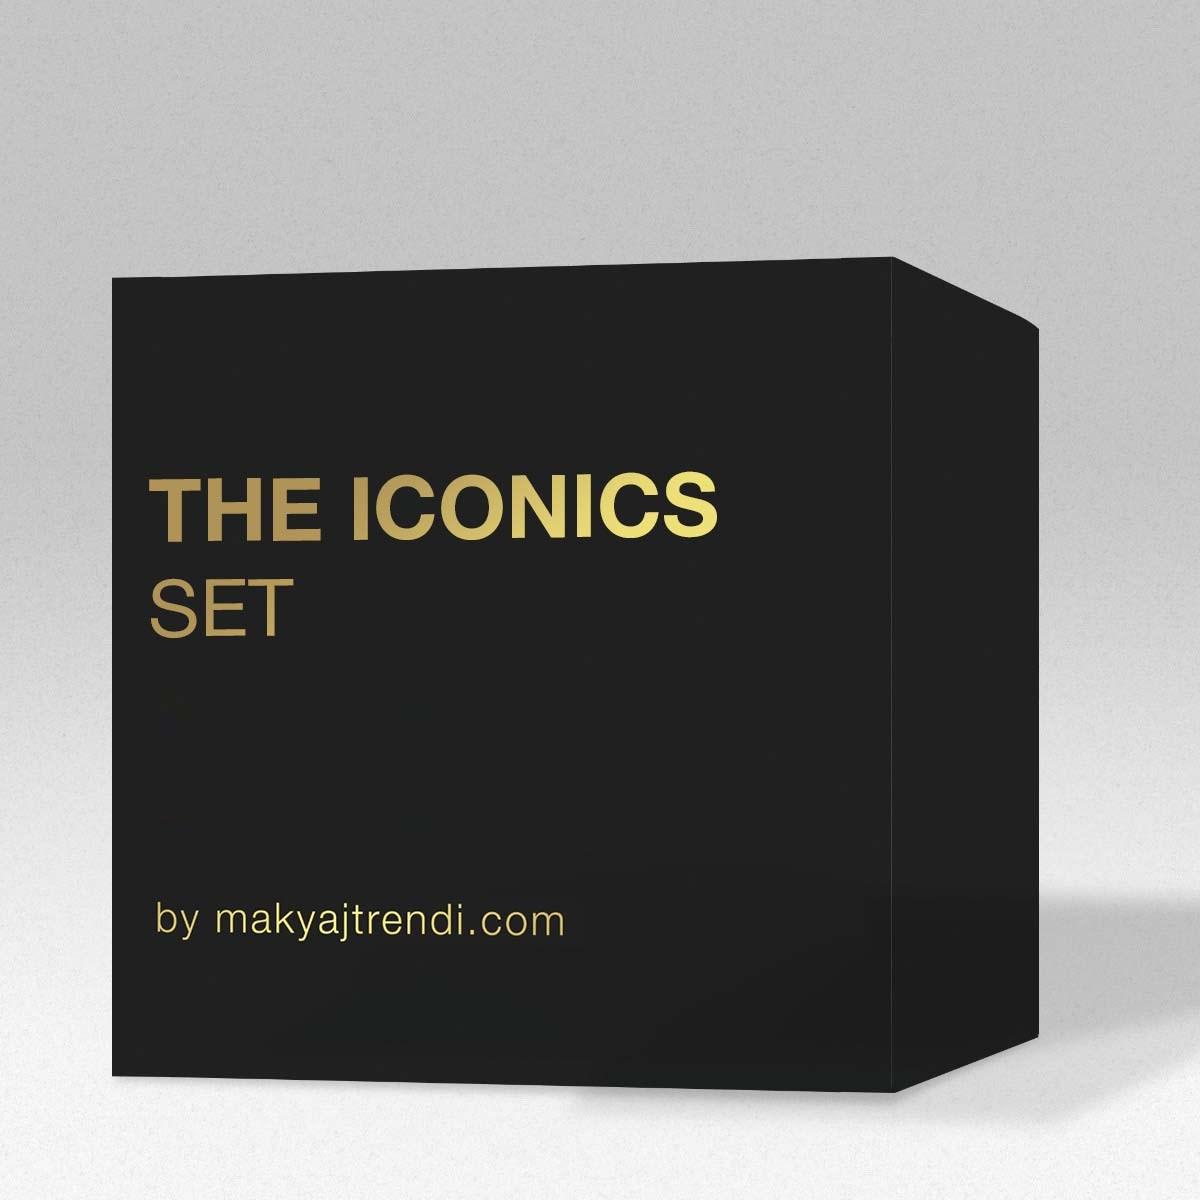 THE ICONICS SET 3